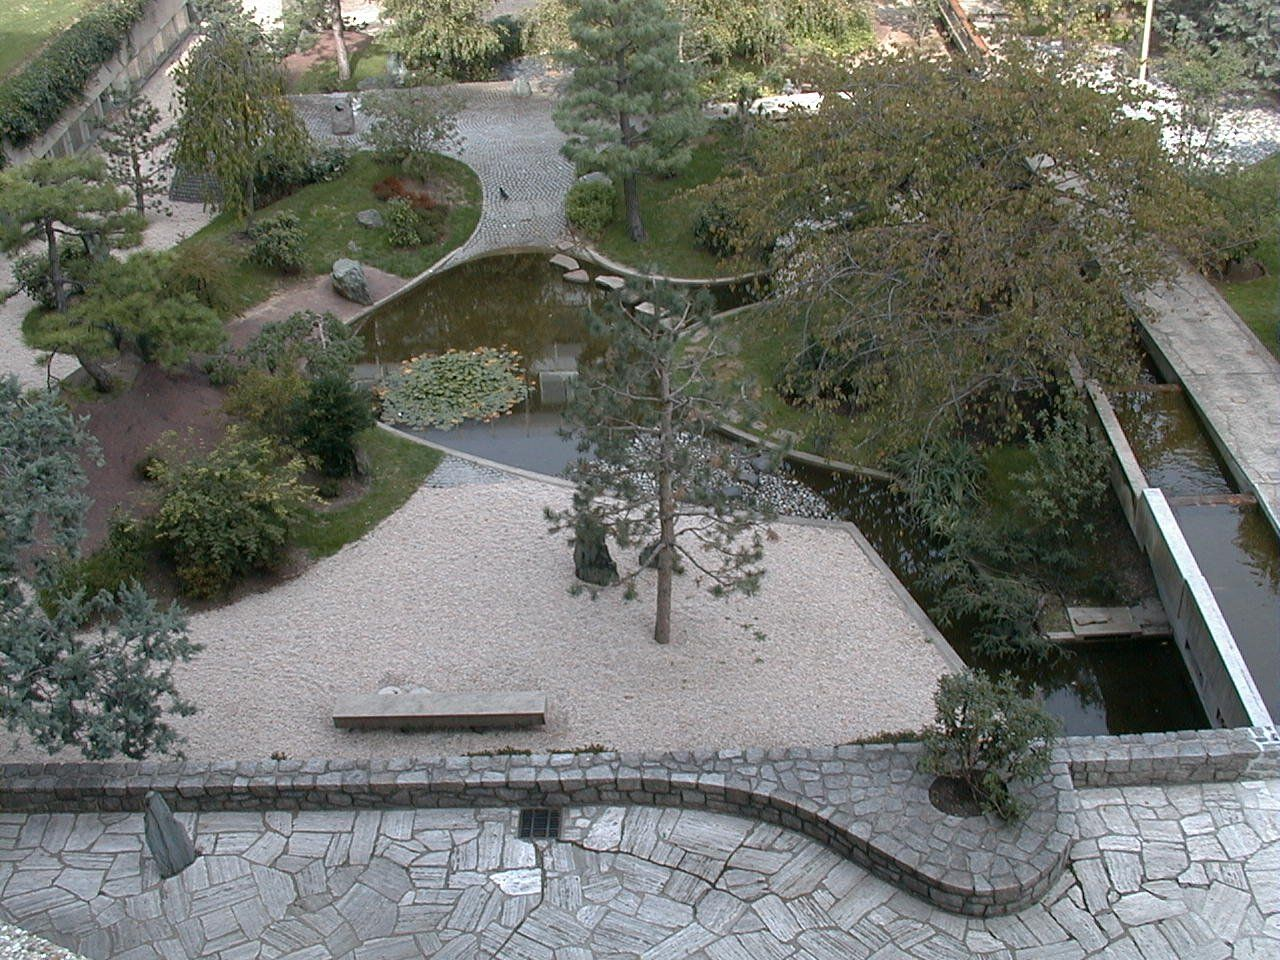 isamu noguchi jardin buscar con google outdoor pinterest isamu noguchi gardens and. Black Bedroom Furniture Sets. Home Design Ideas